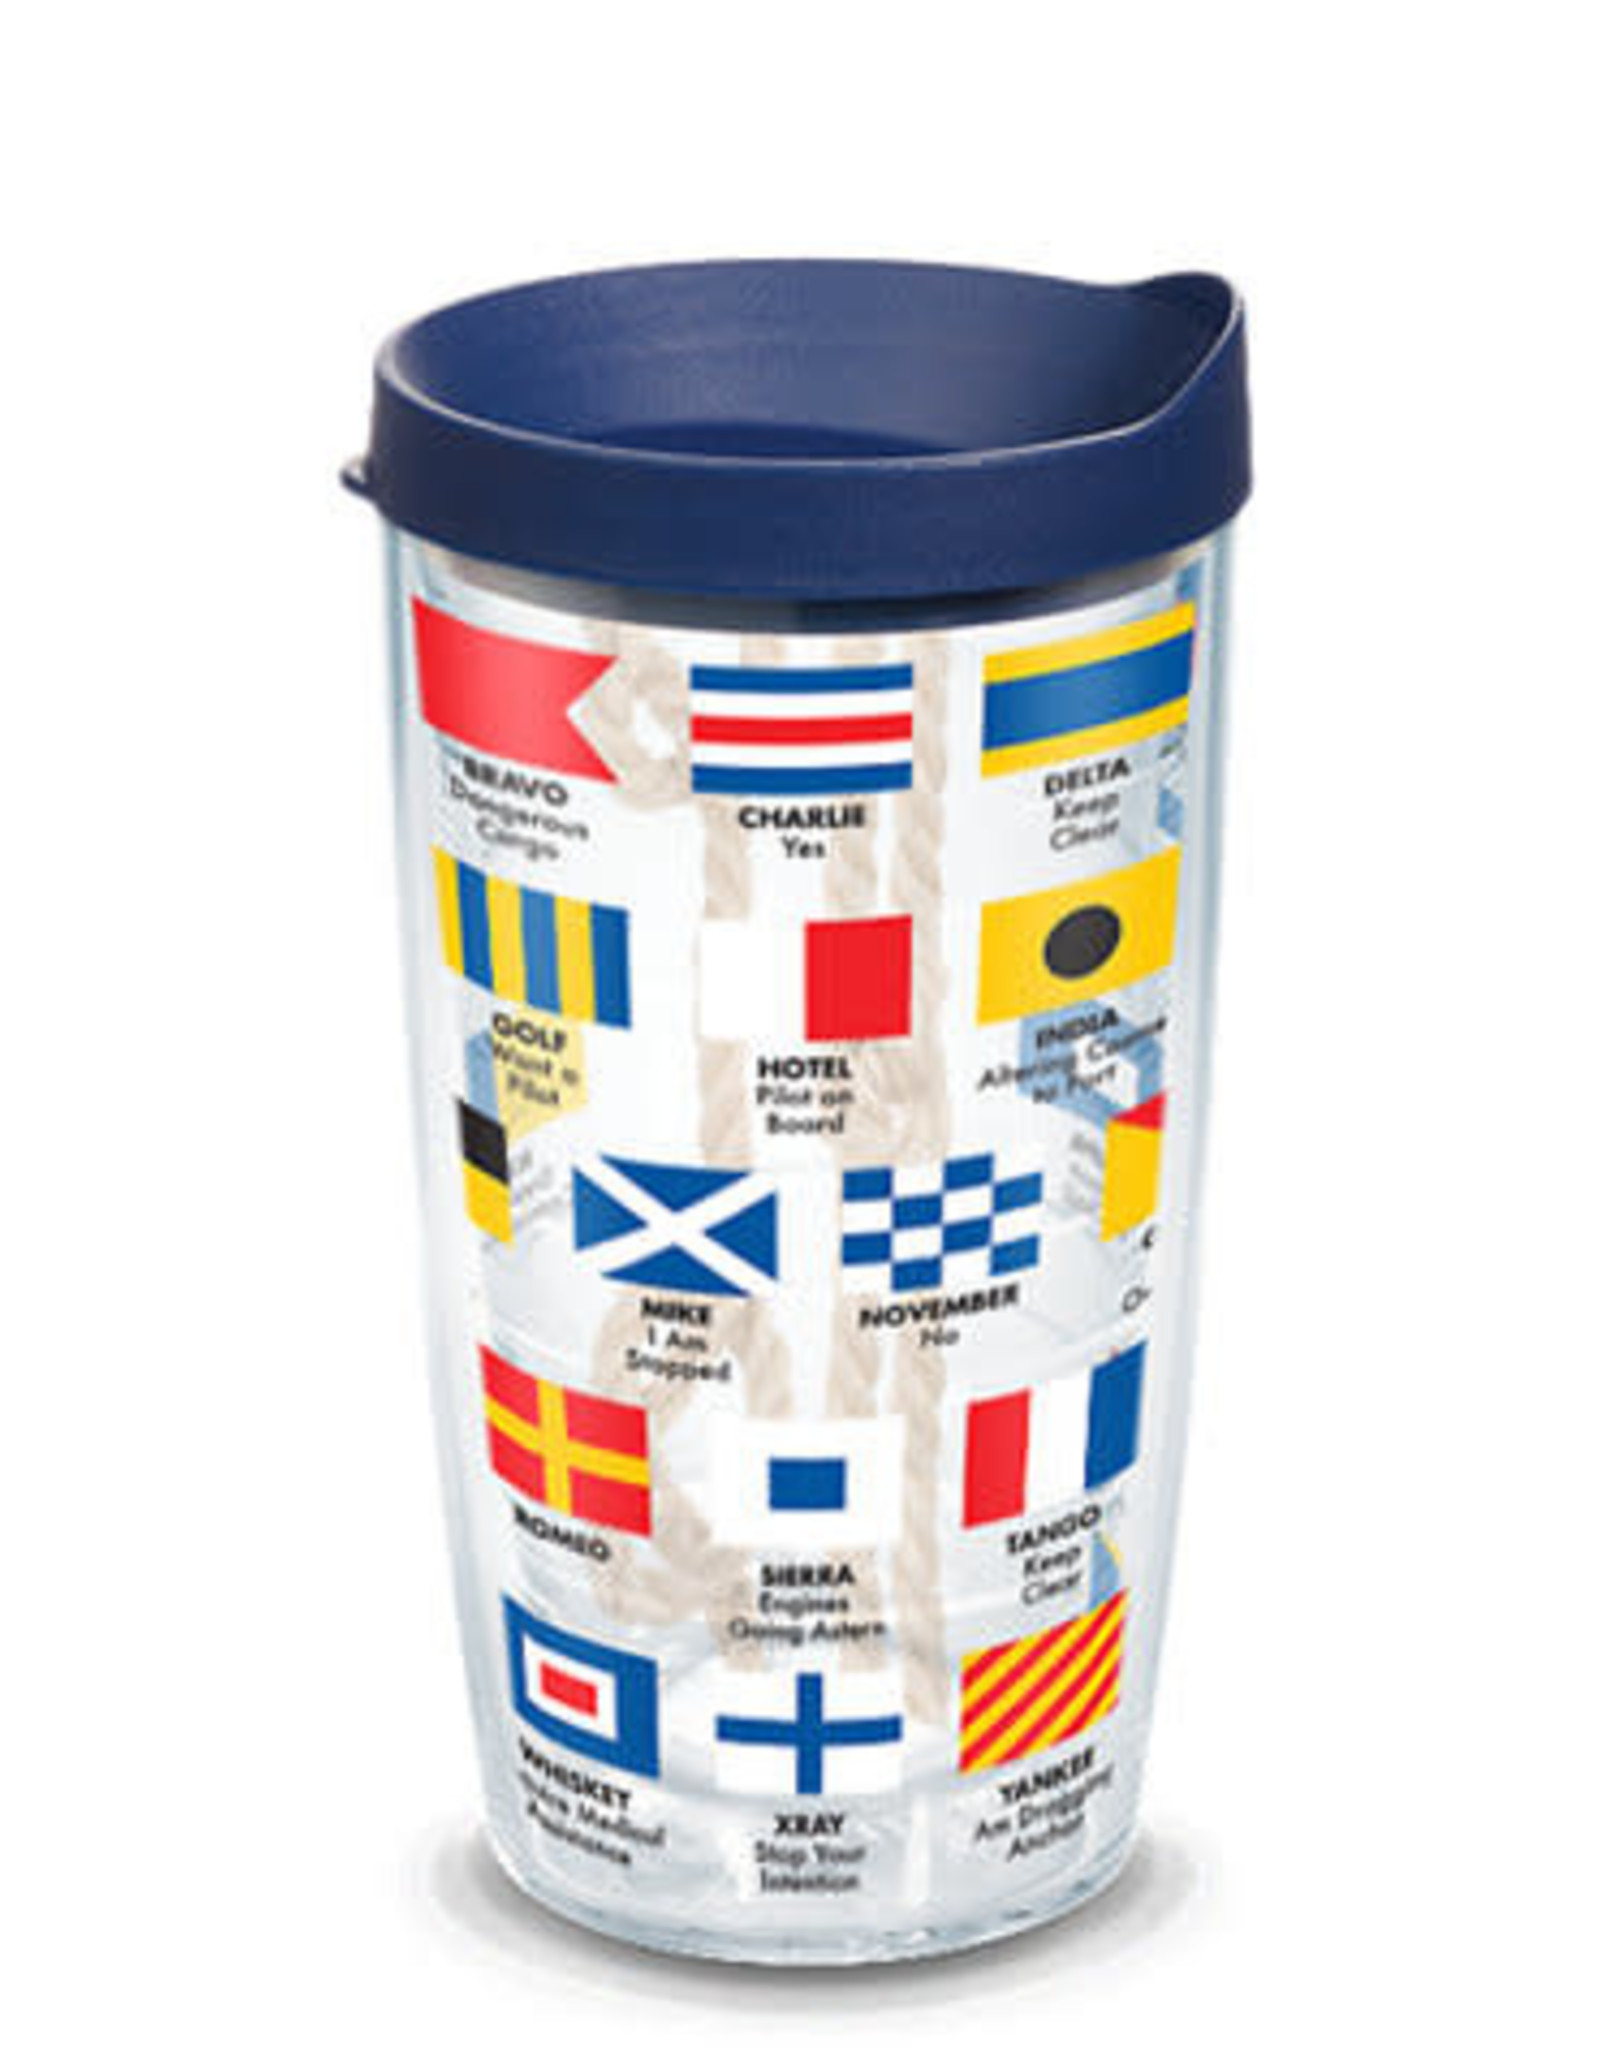 Tervis Tumbler 16oz/lid Nautical Flag